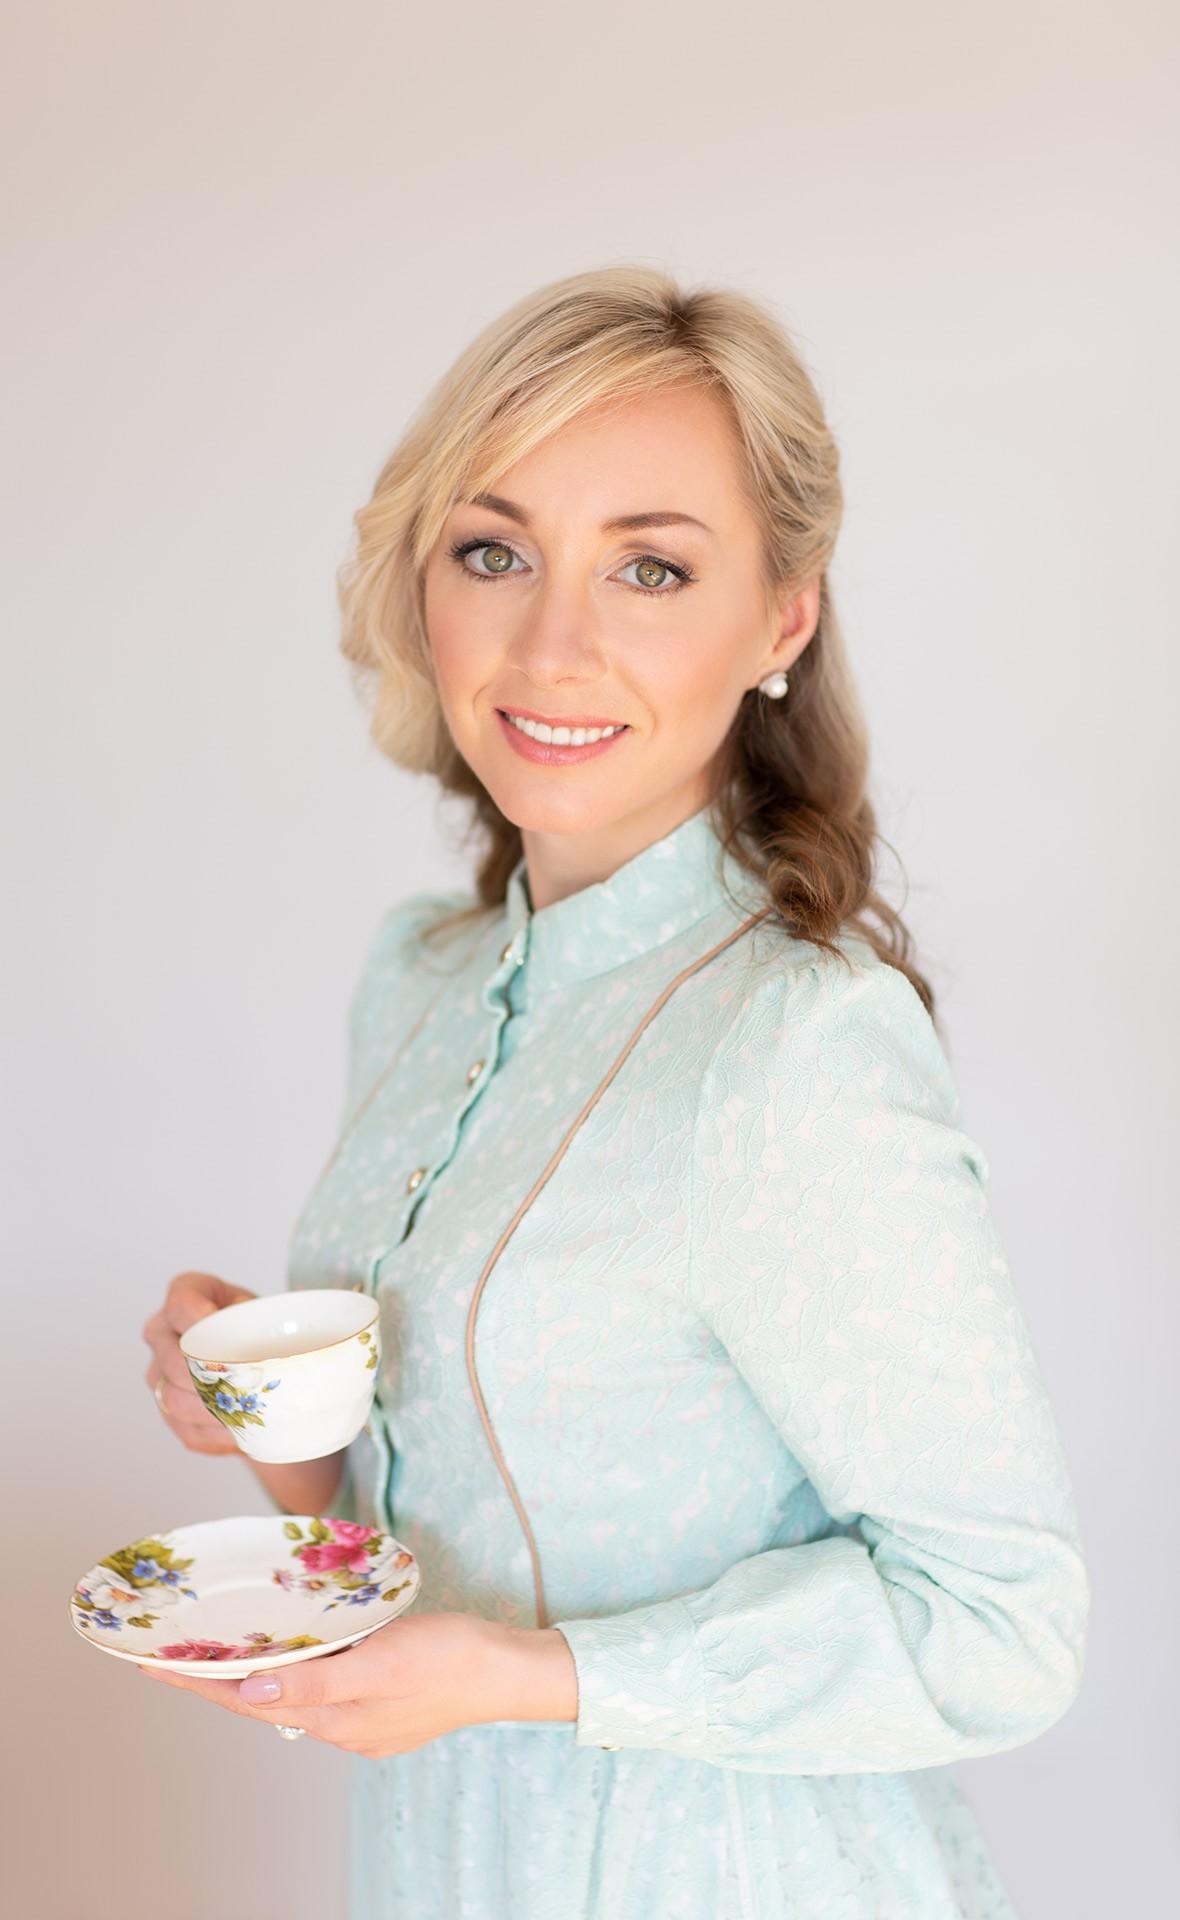 Елена Балацкая - психолог, аюрведа